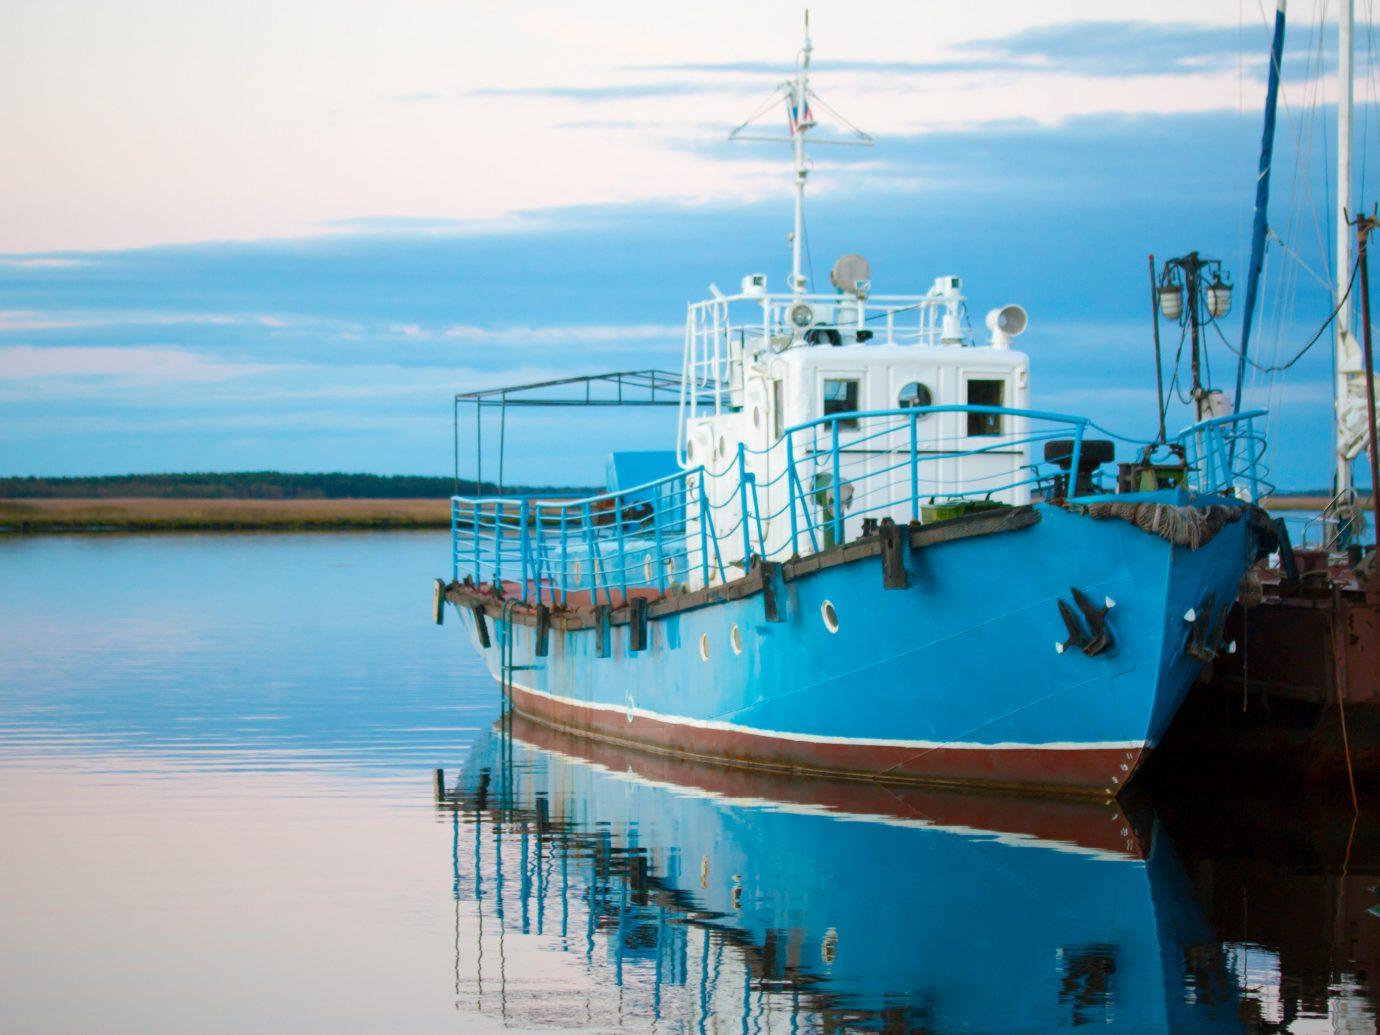 Secret Getaways Travel Tips water water transportation waterway Boat reflection fishing vessel sky Sea motor ship watercraft Harbor ship marina